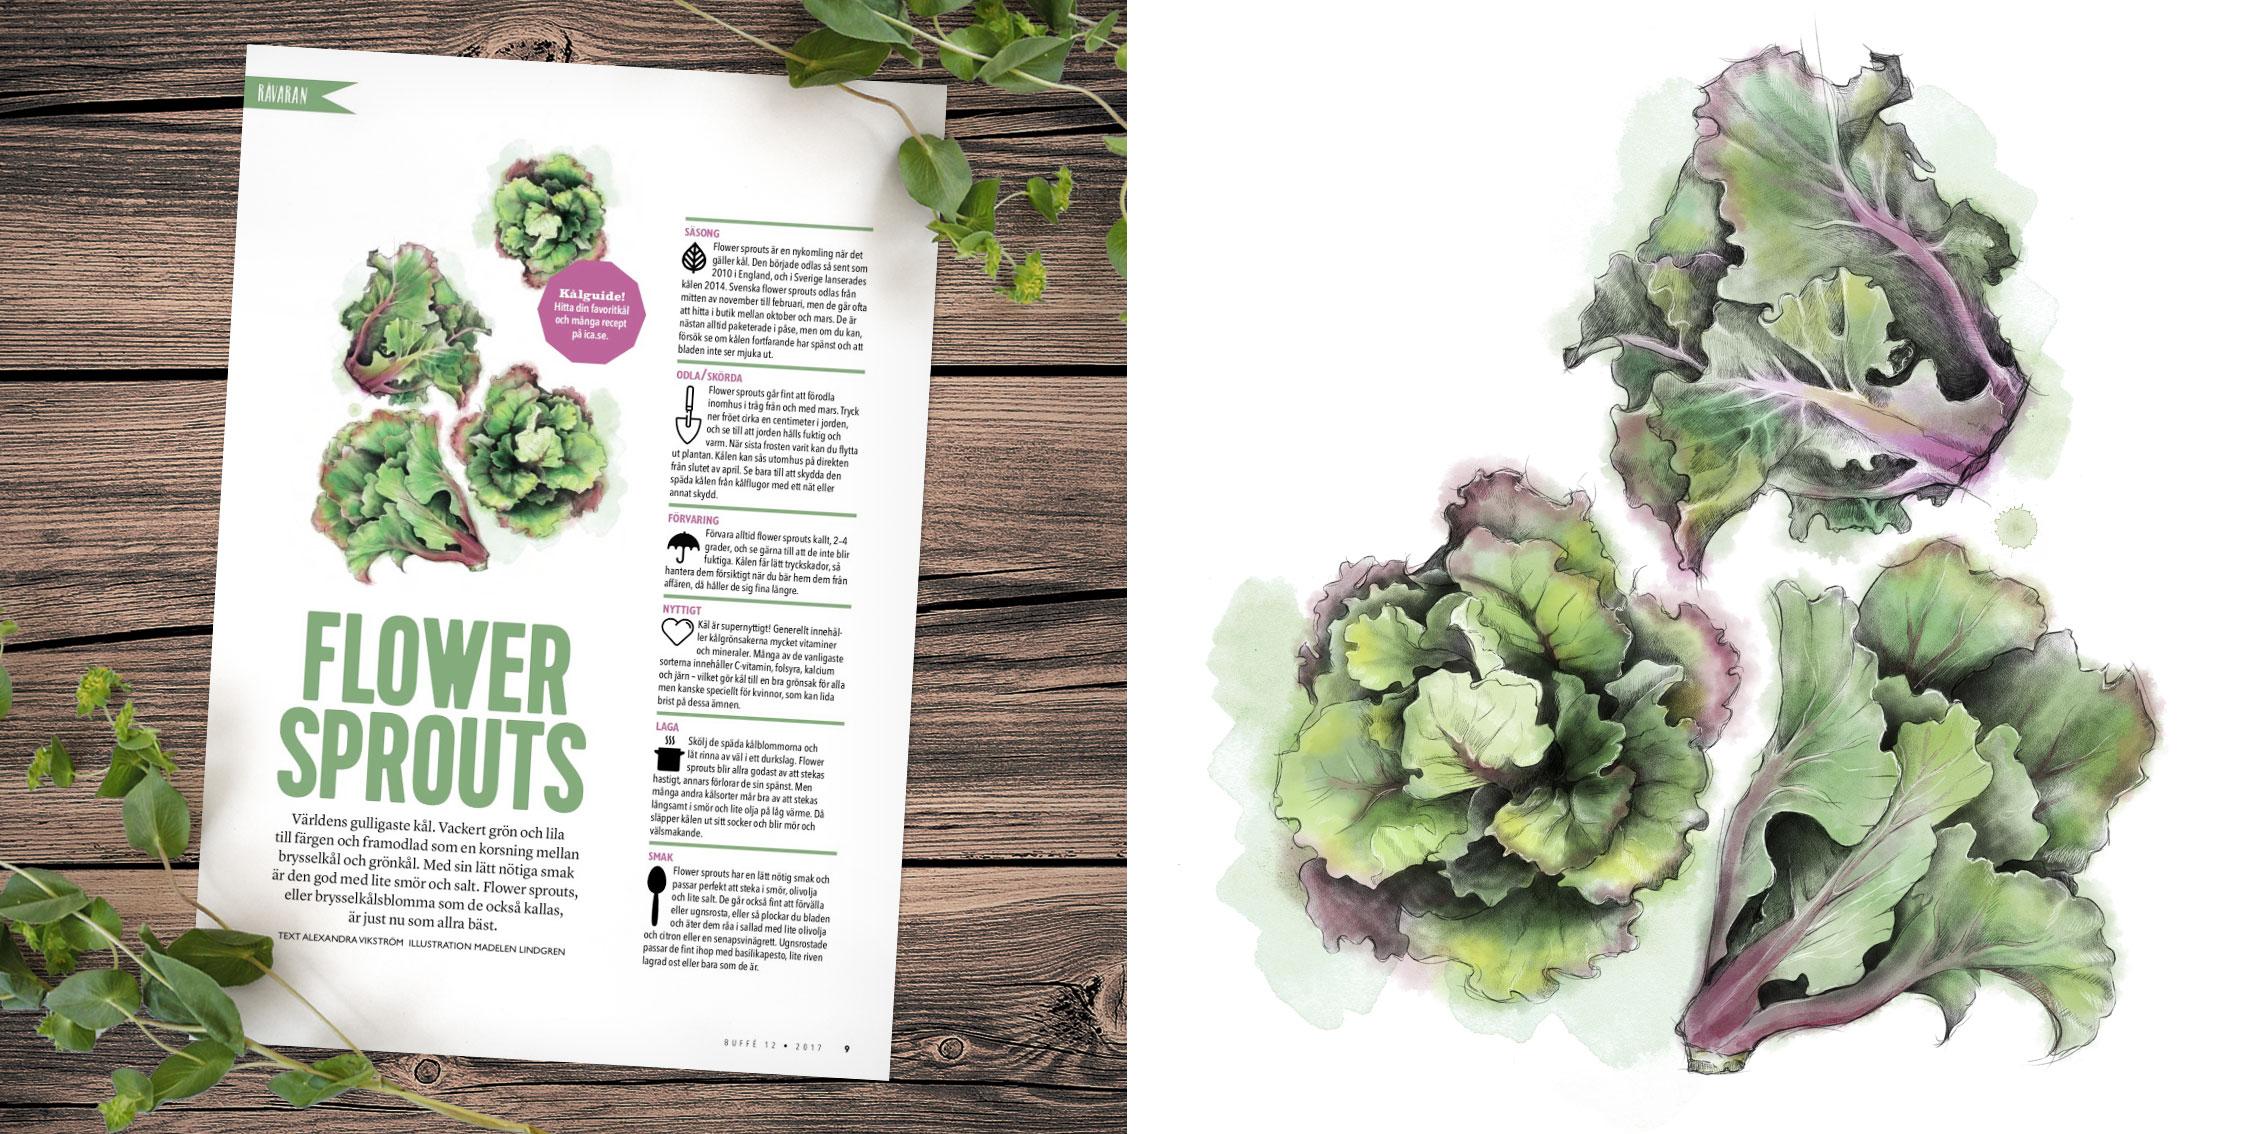 Buffe-sprouts.jpg